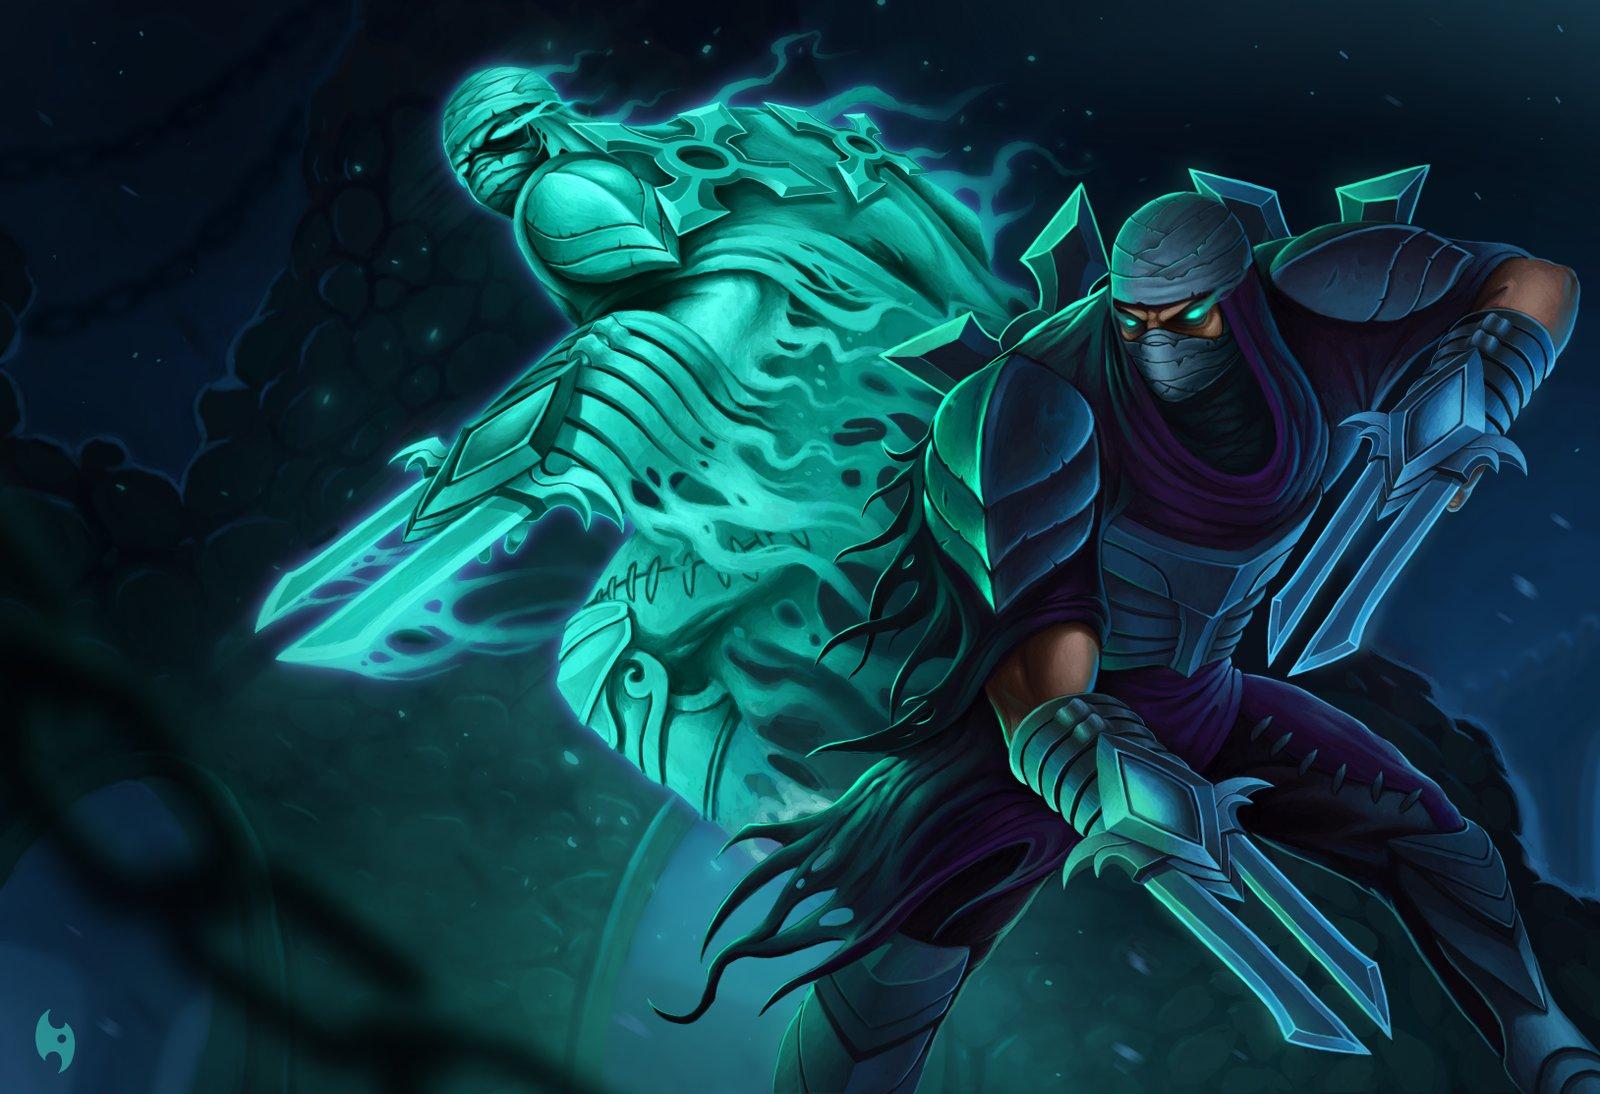 Zed League Of Legends Wallpapers